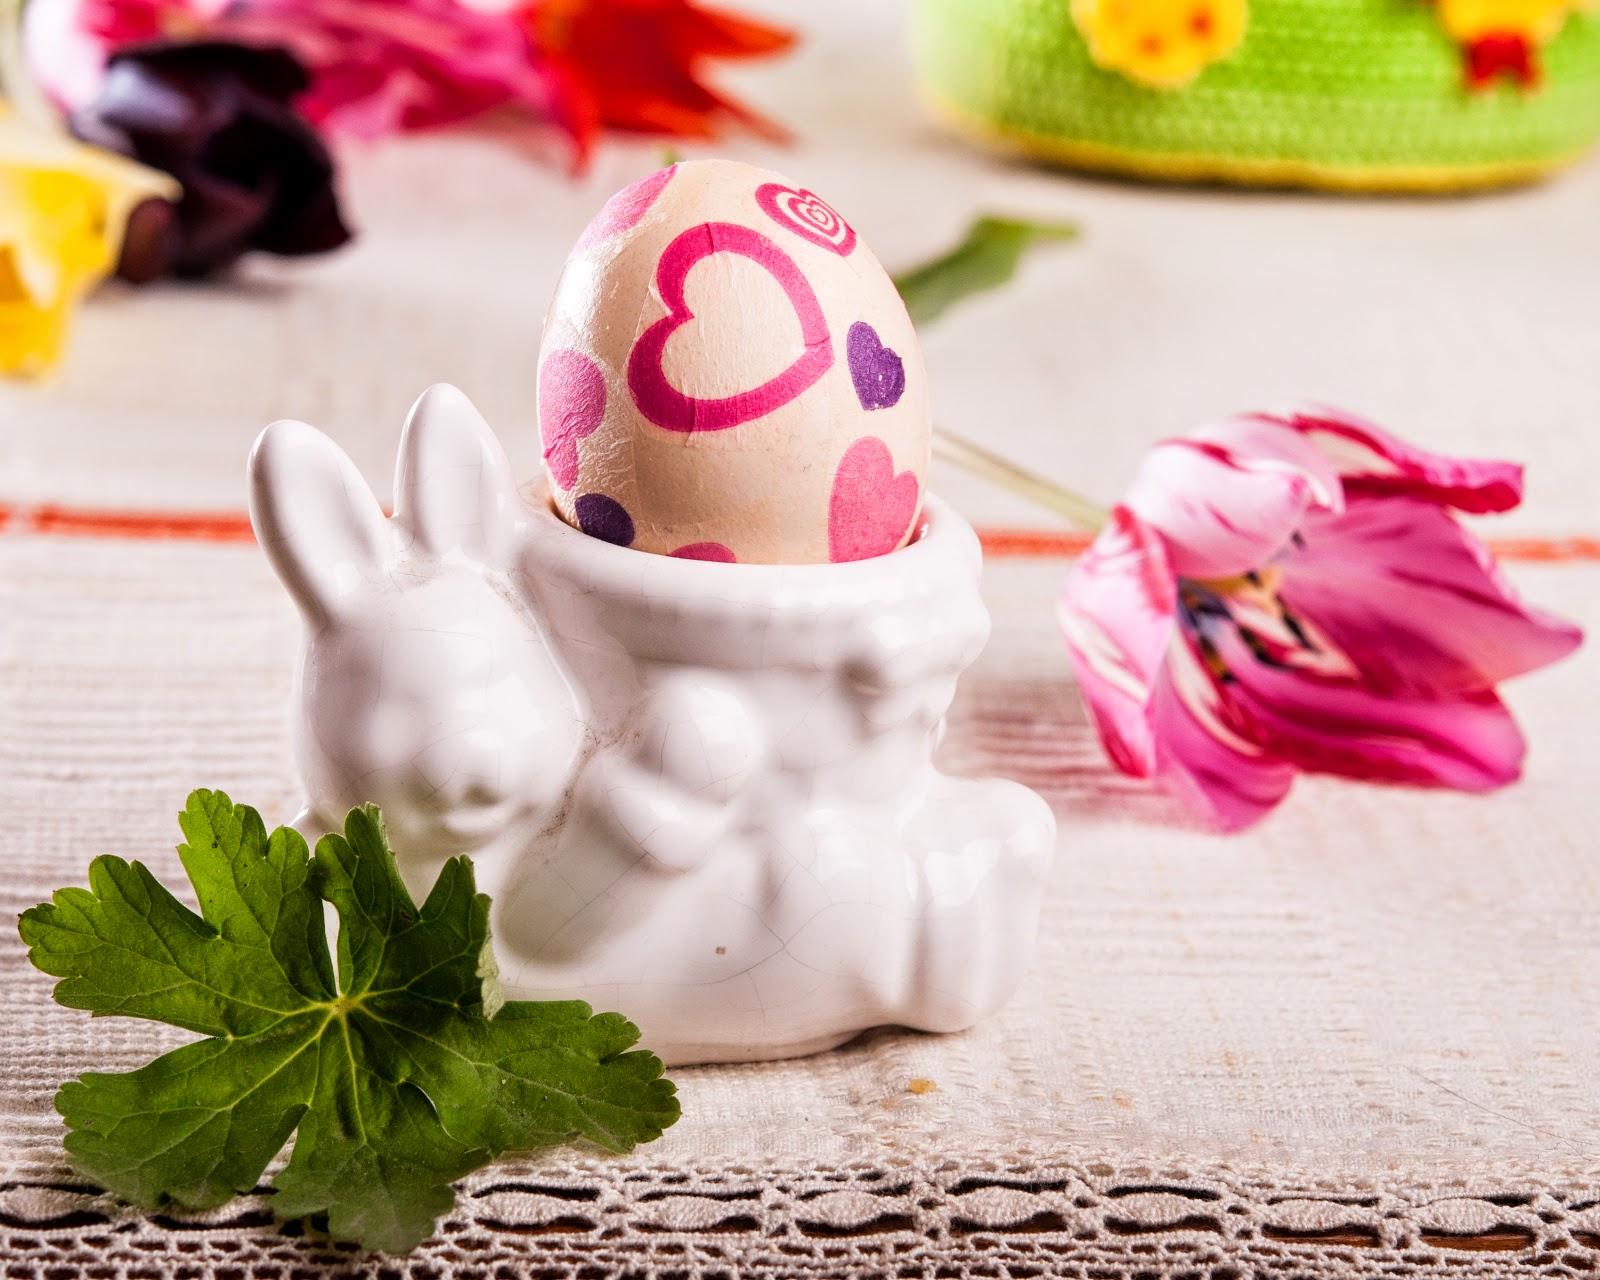 Великденски яйца украсени с техника декупаж